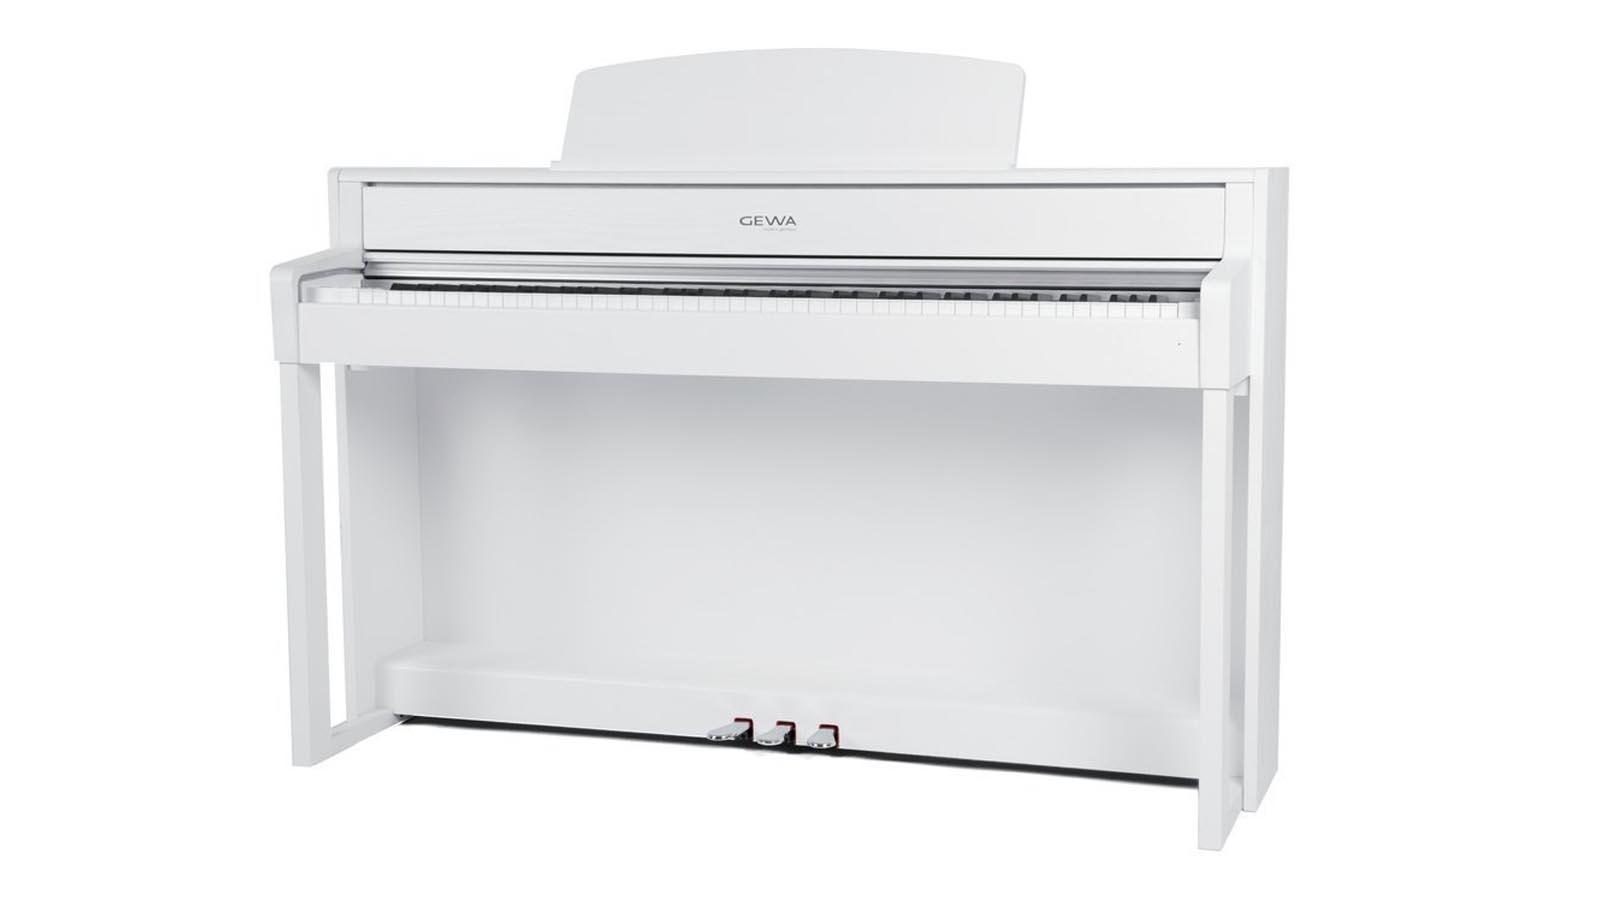 Gewa UP380WK WH E-Piano Weiß matt Holztasten